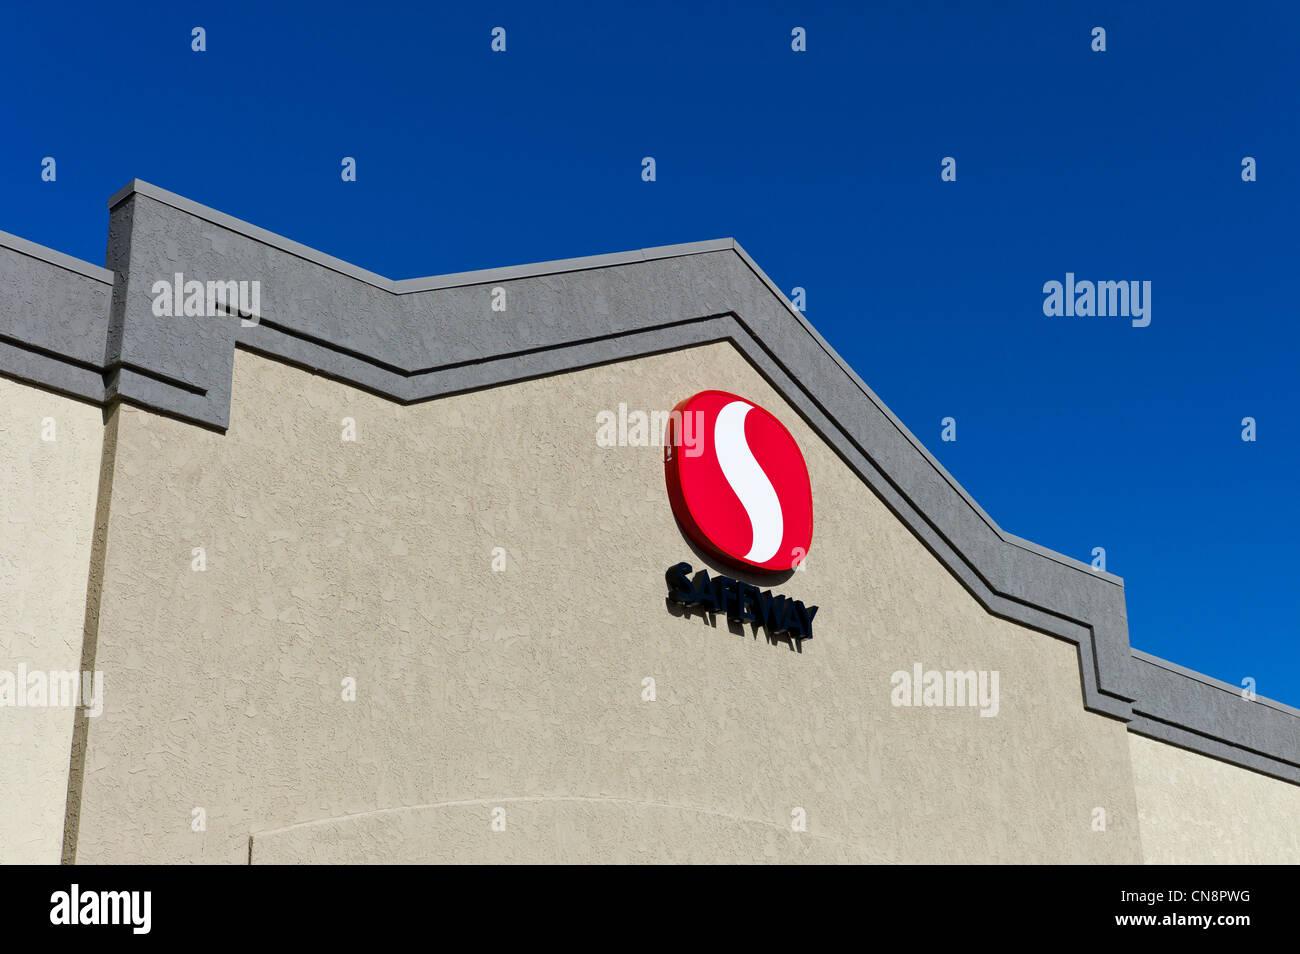 Safeway-Supermarkt, Salida, Colorado, USA Stockbild